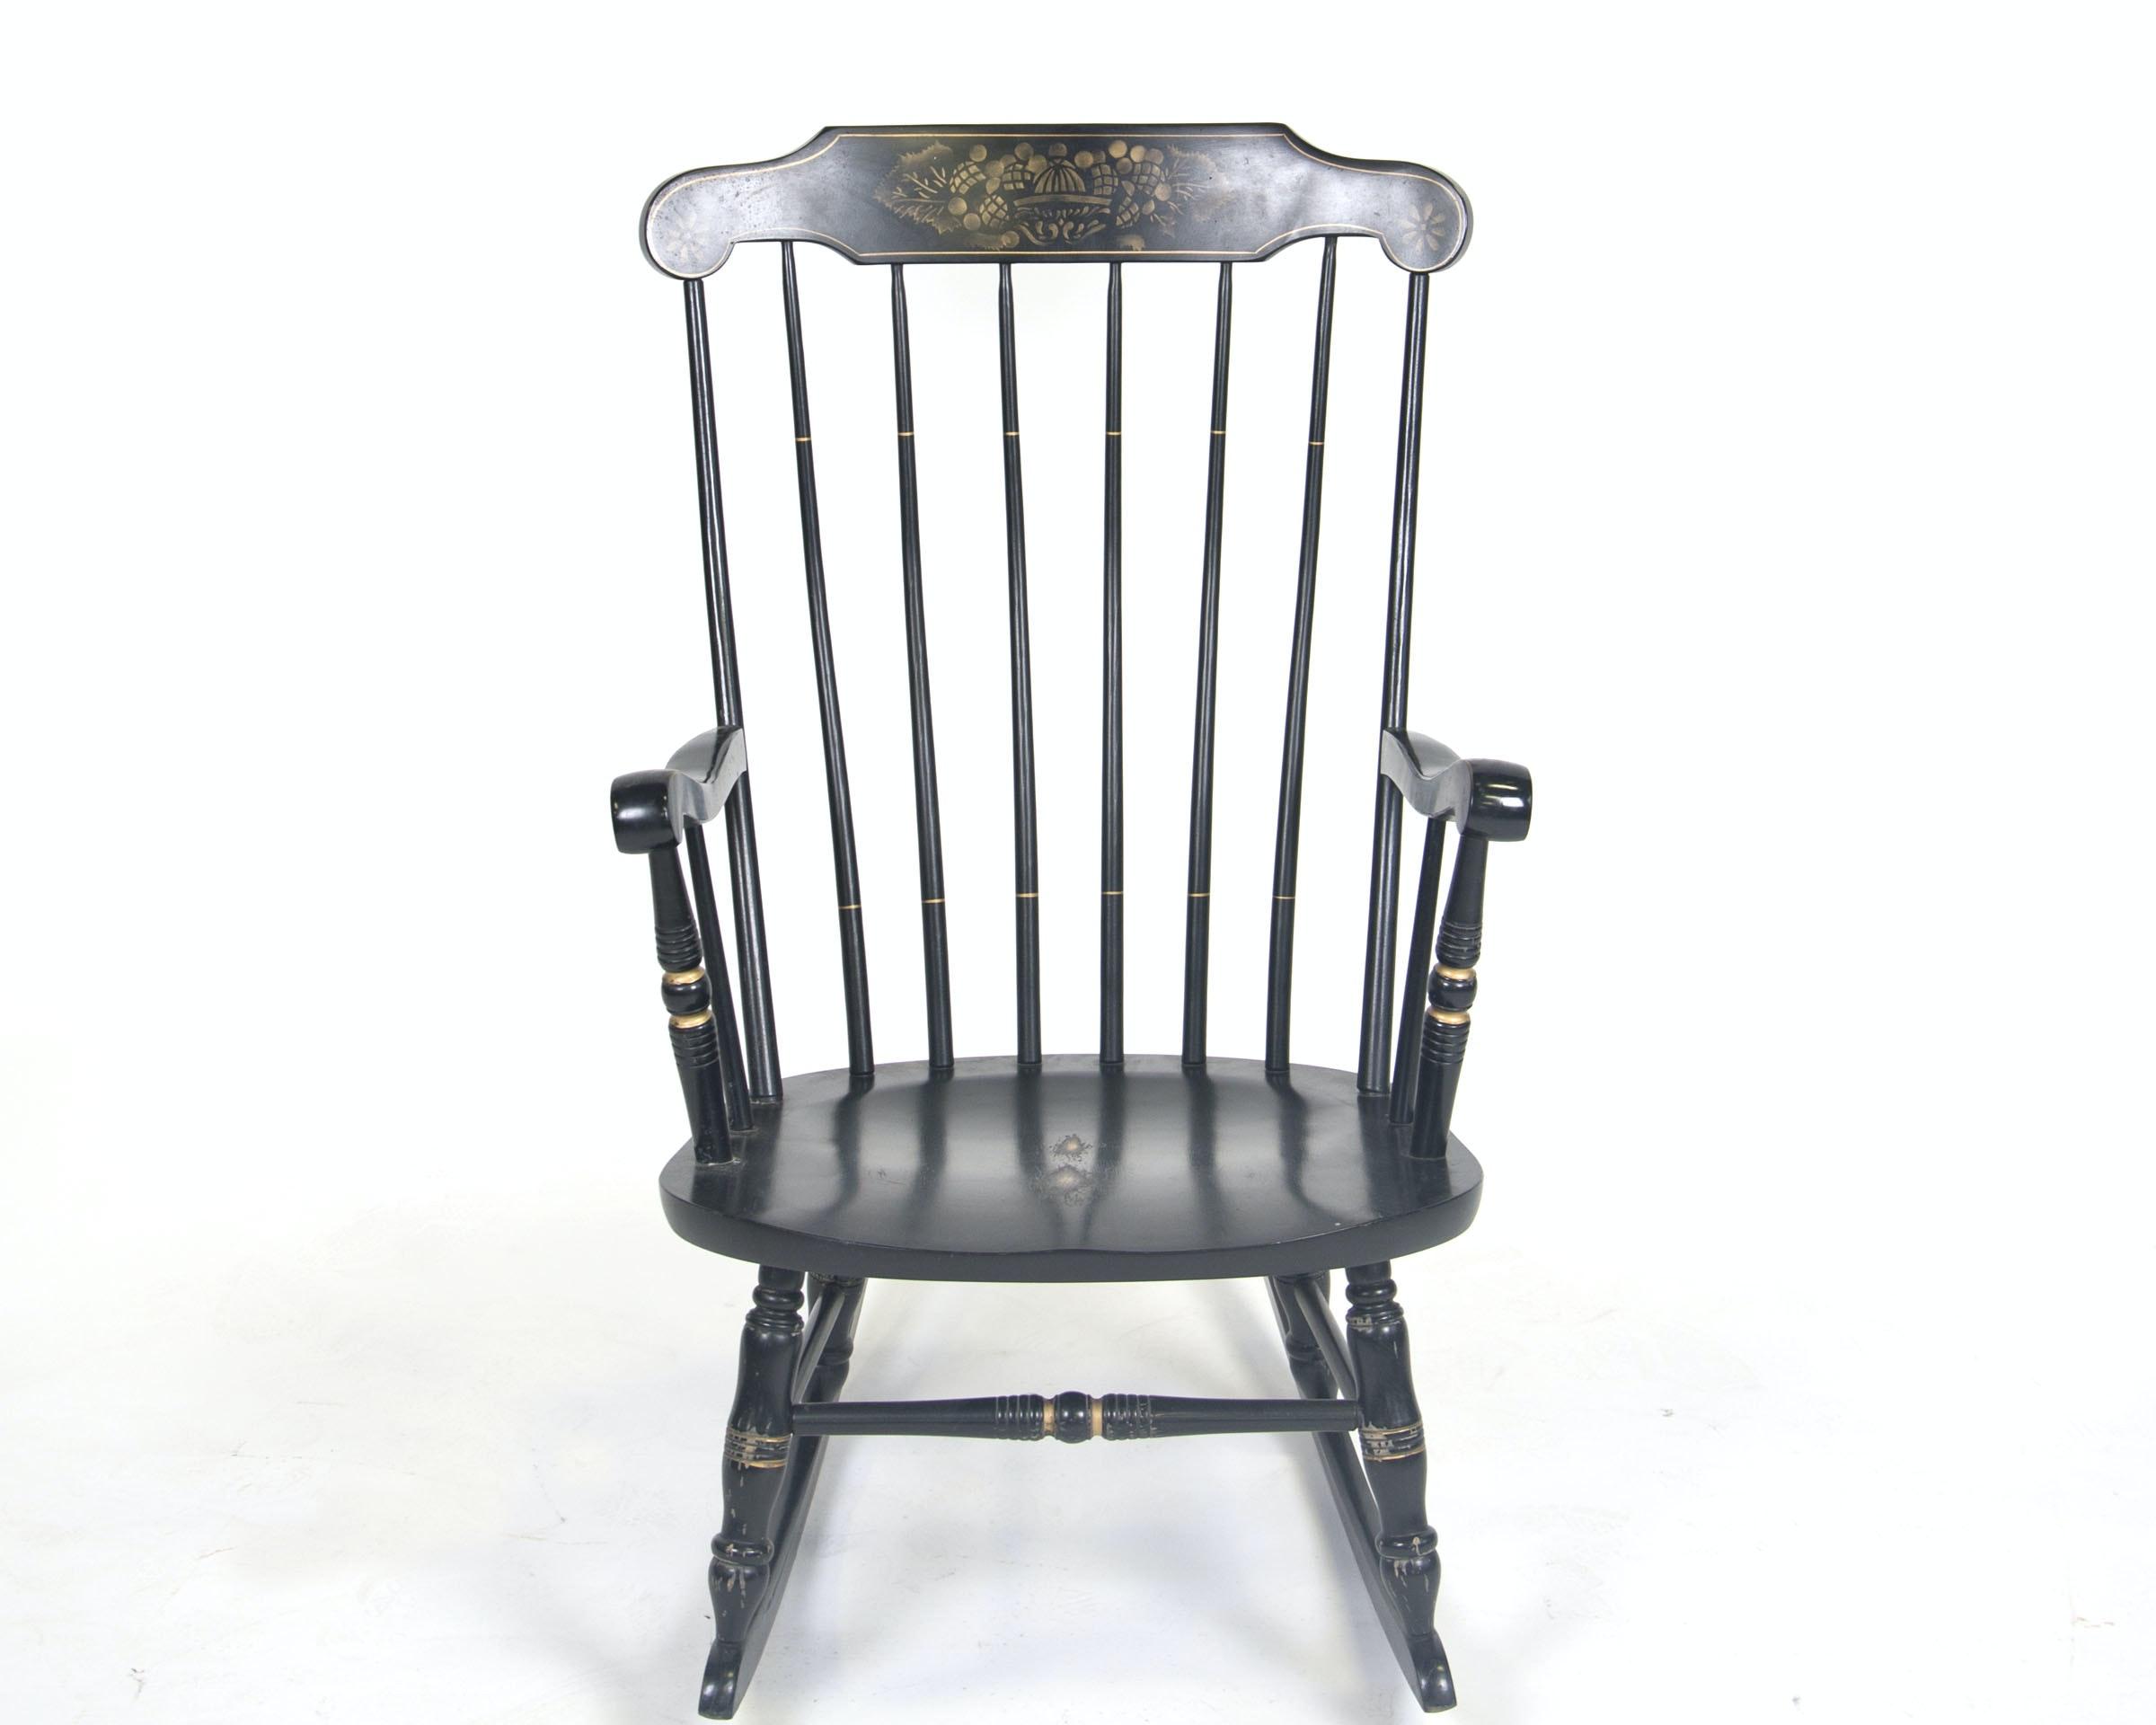 S. Bent & Bros. Rocking Chair